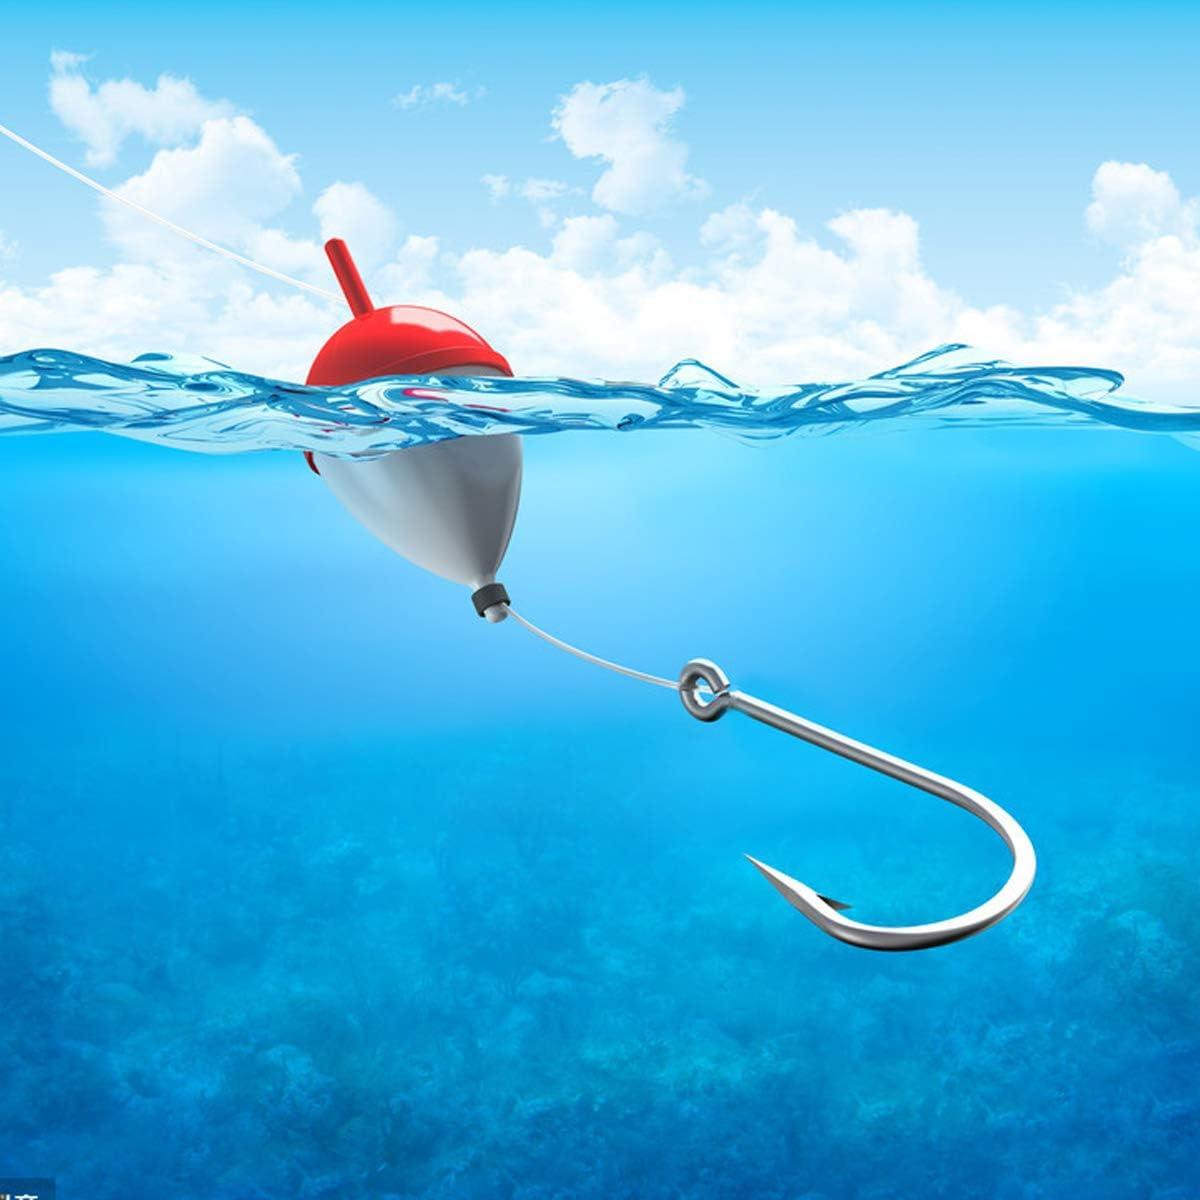 Carp Circle Hooks with Storage Box for Freshwater Saltwater Fish Trackle 3#-12# Barbed Hooks 500PCS Fishing Hook Carbon Steel Eyed Sea Fish Hooks